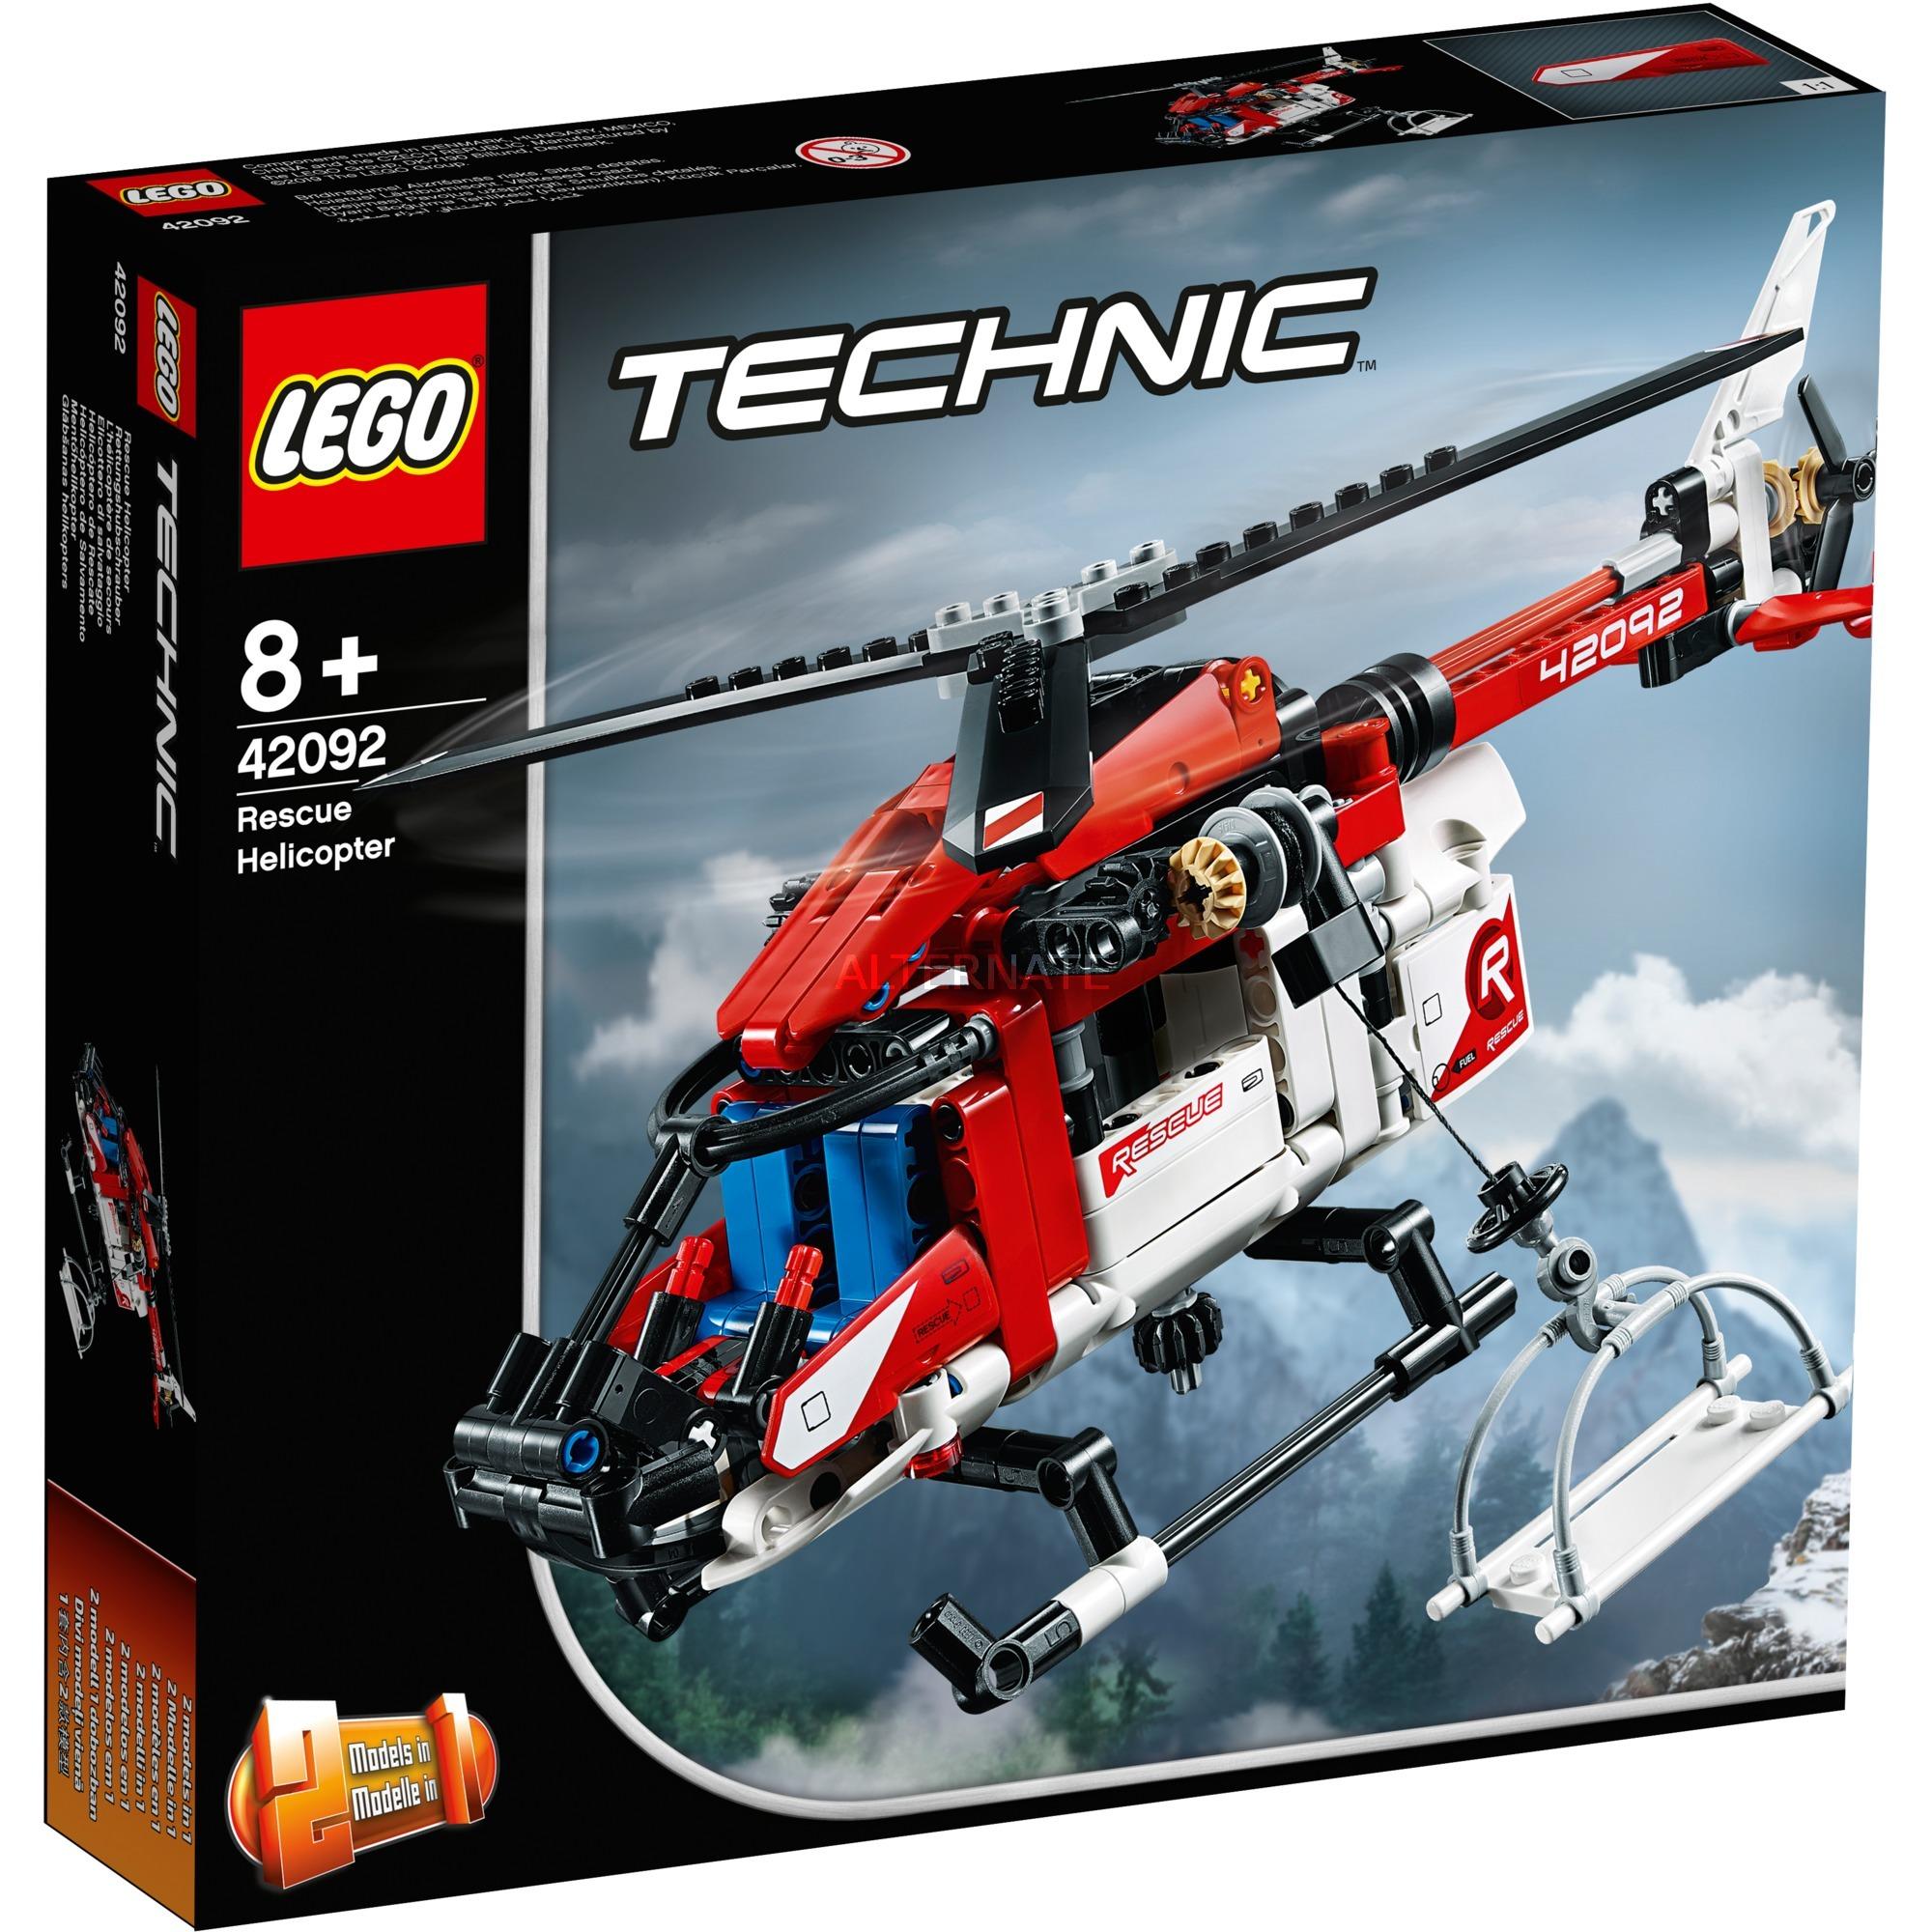 LEGO Technic - Helicóptero de Rescate - 42092